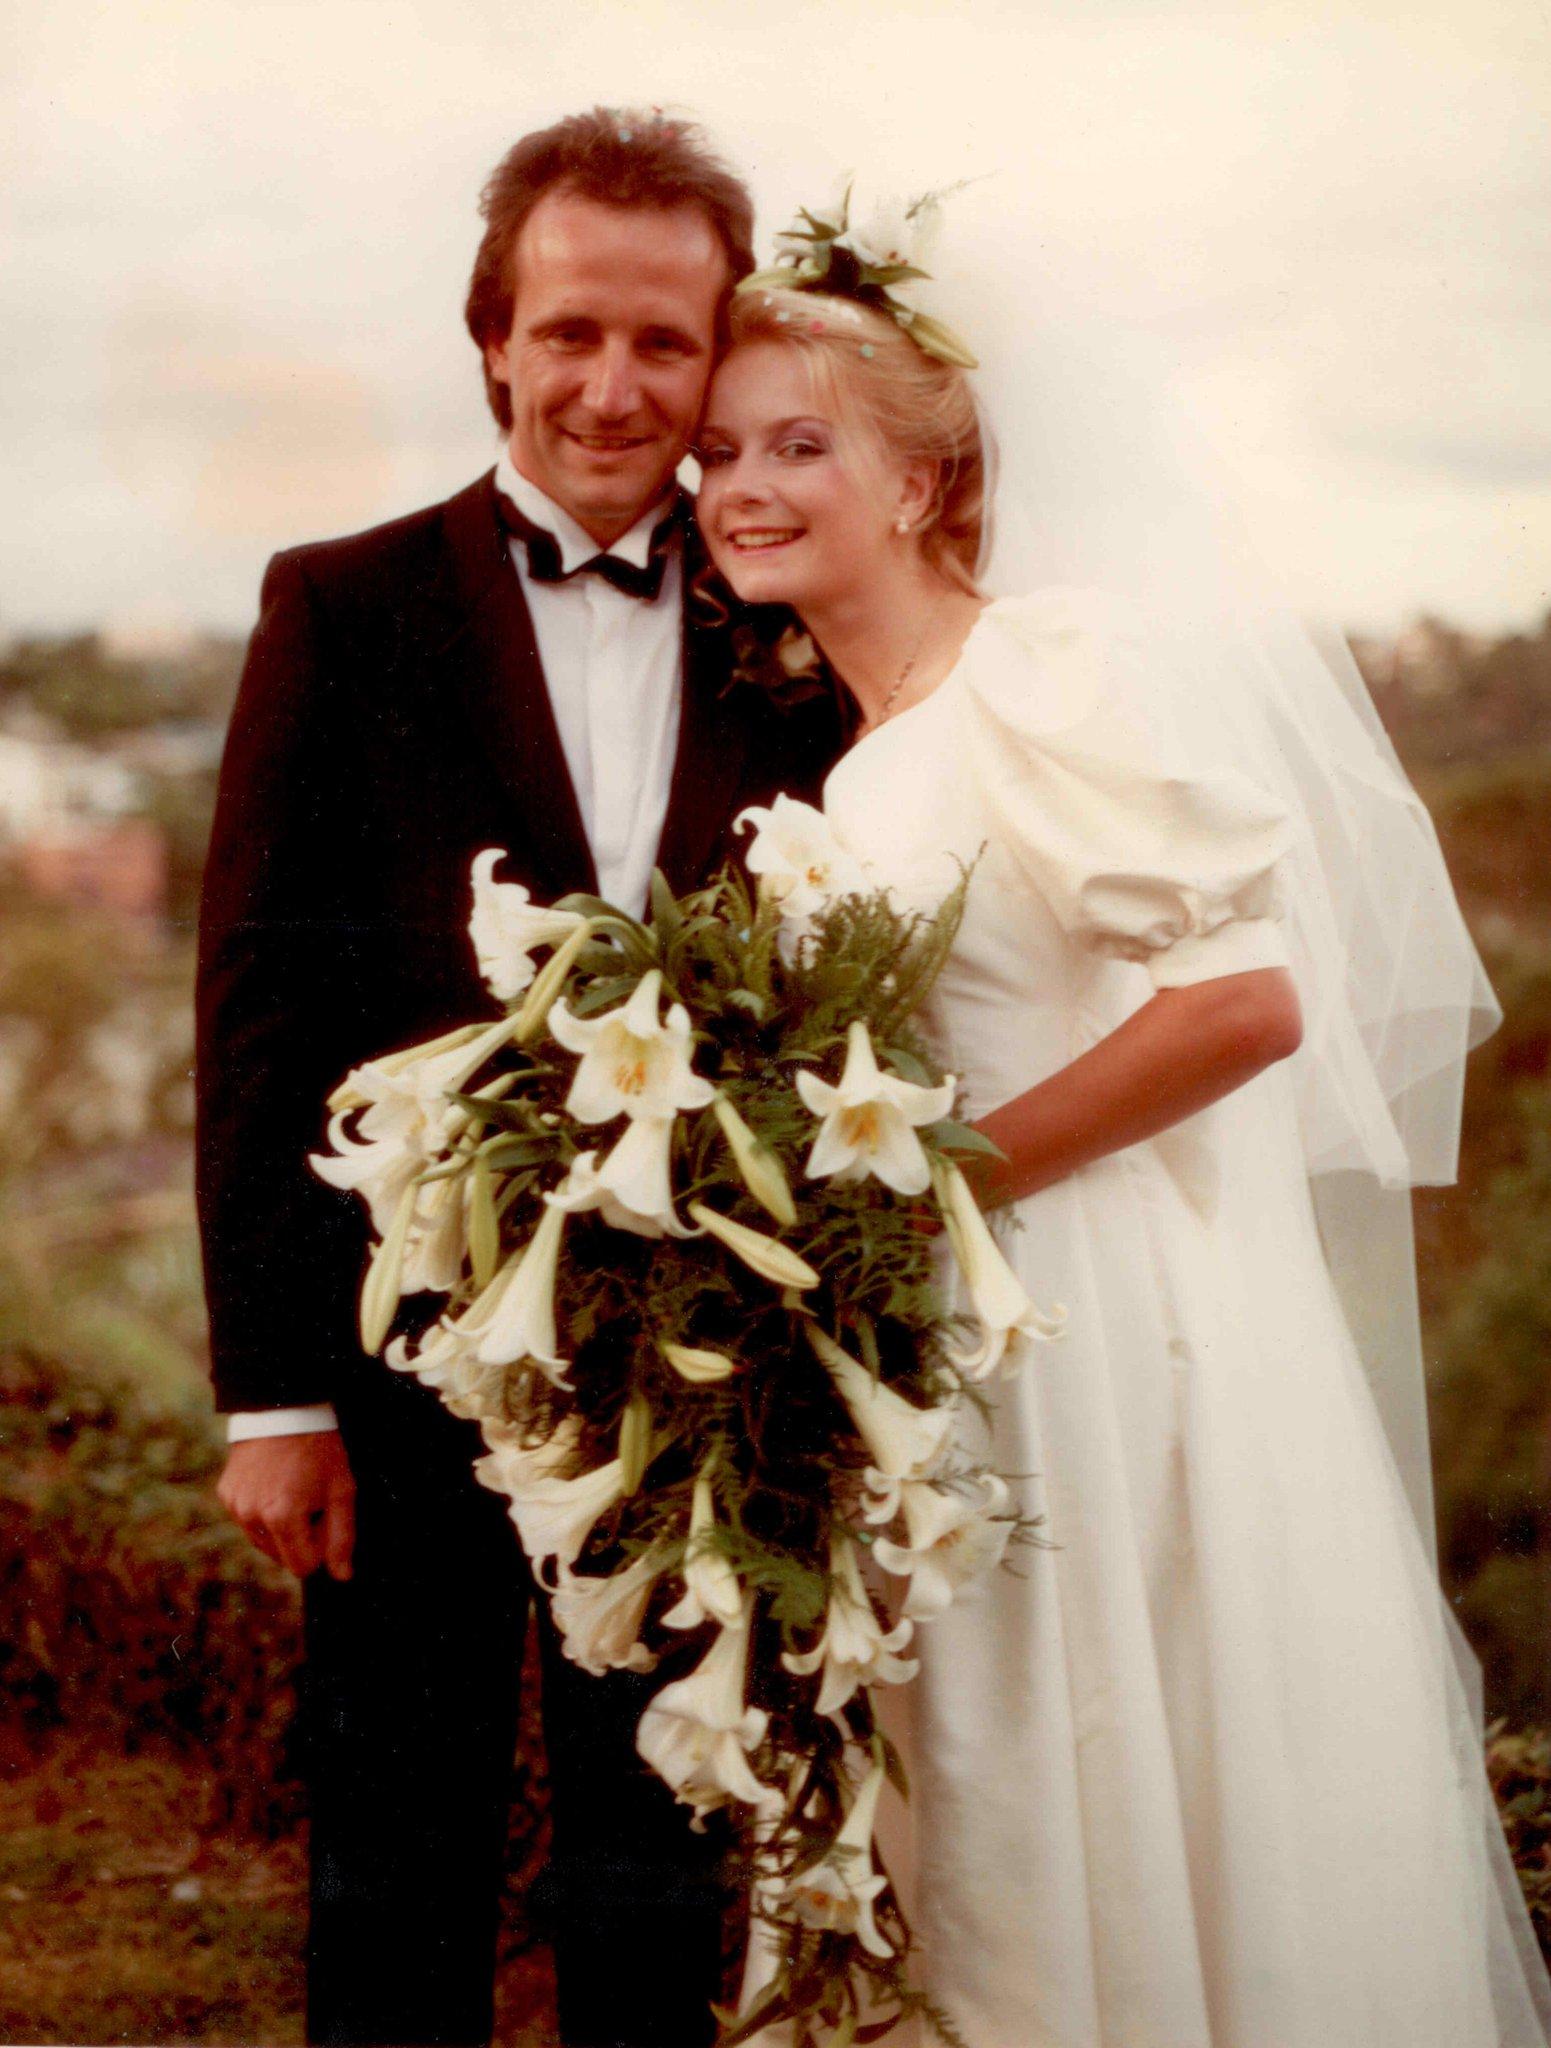 J and R wedding photo.jpg